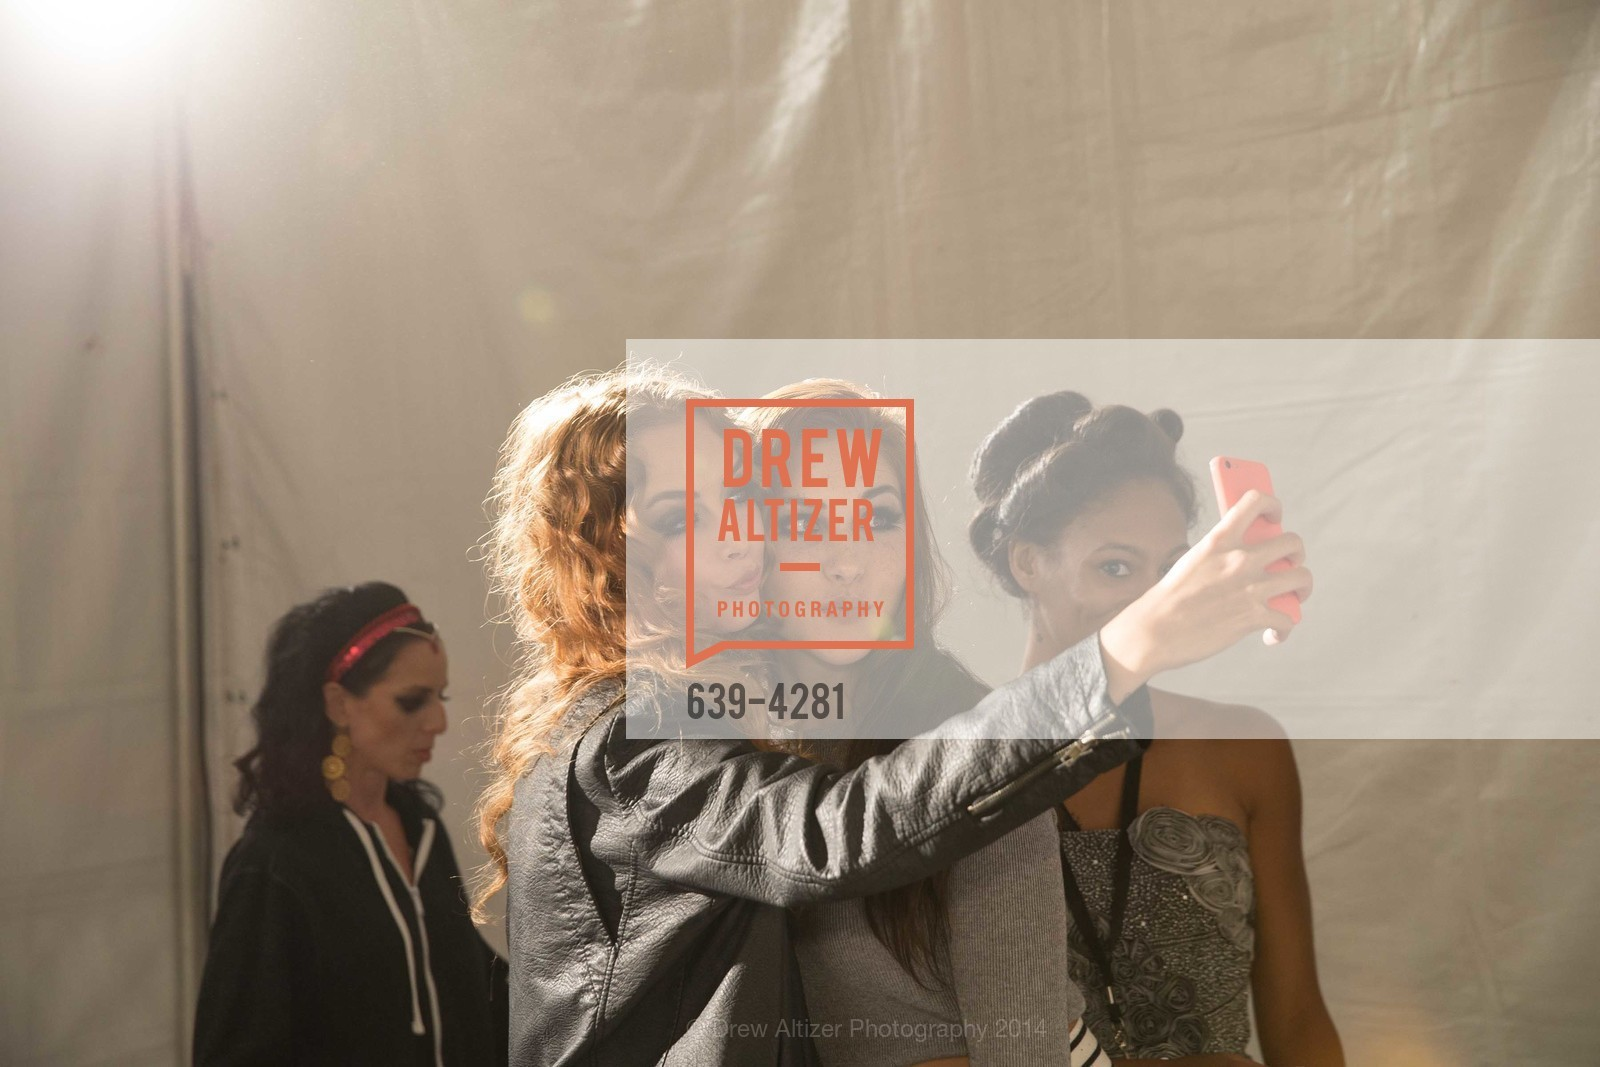 Backstage, Photo #639-4281